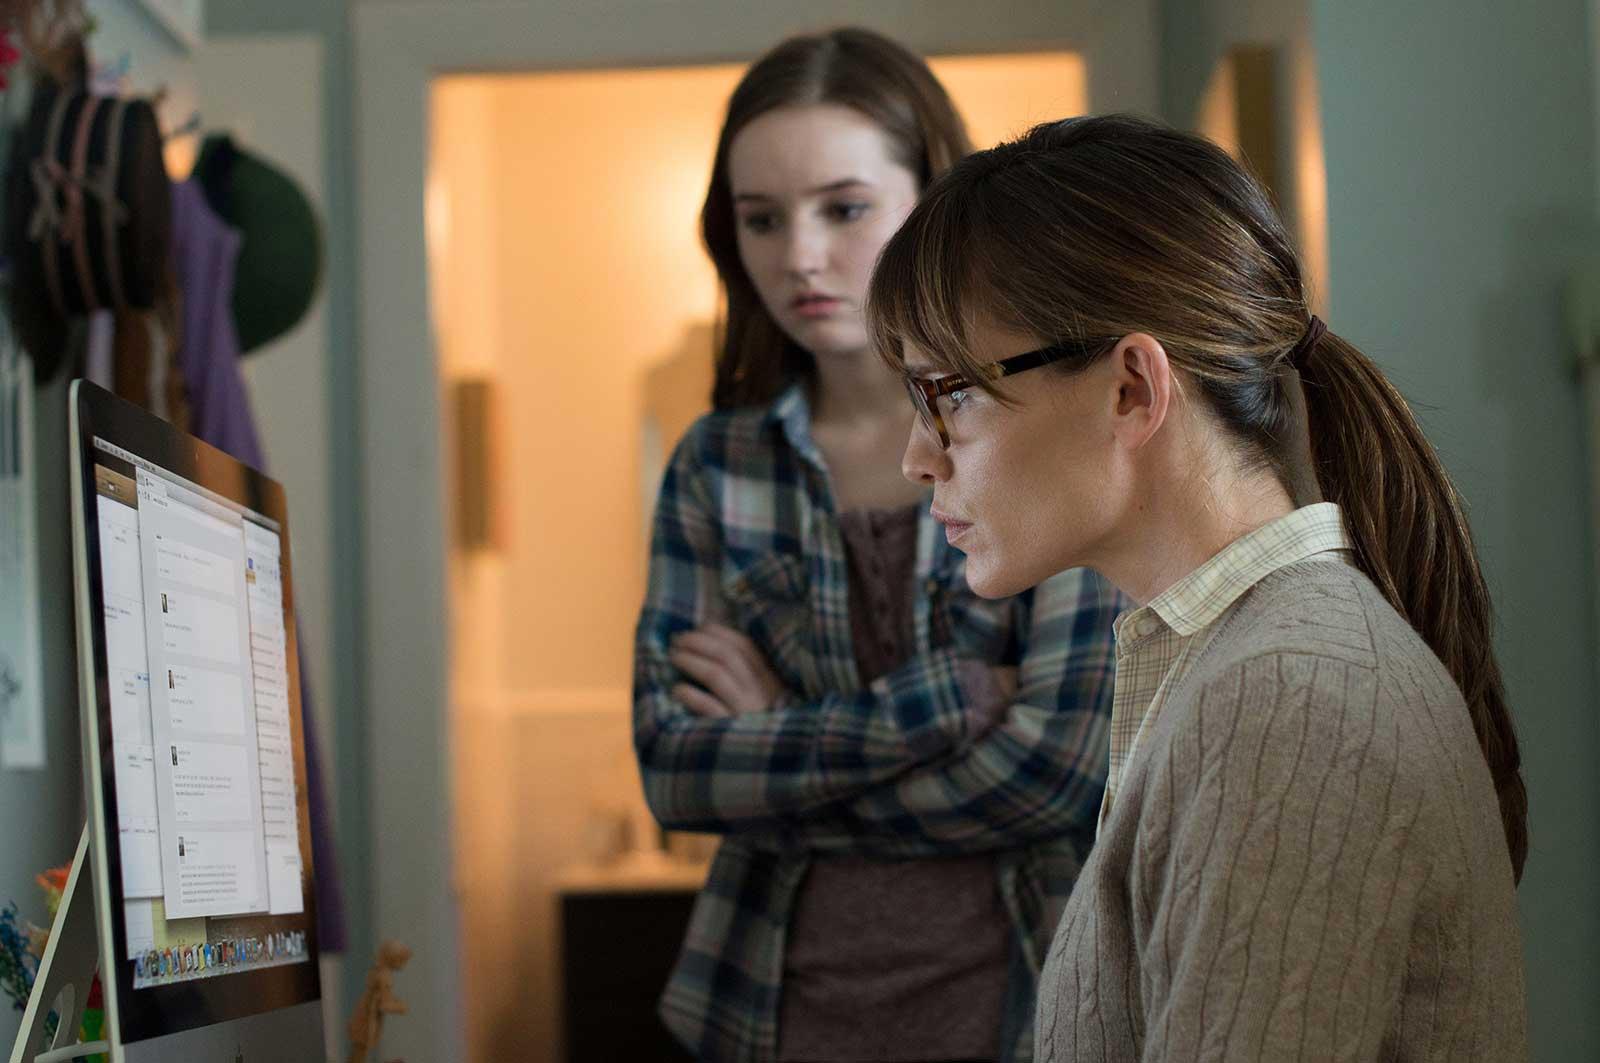 Jennifer Garner plays an intenet snooping mother in Paramount's Men, Women & Children